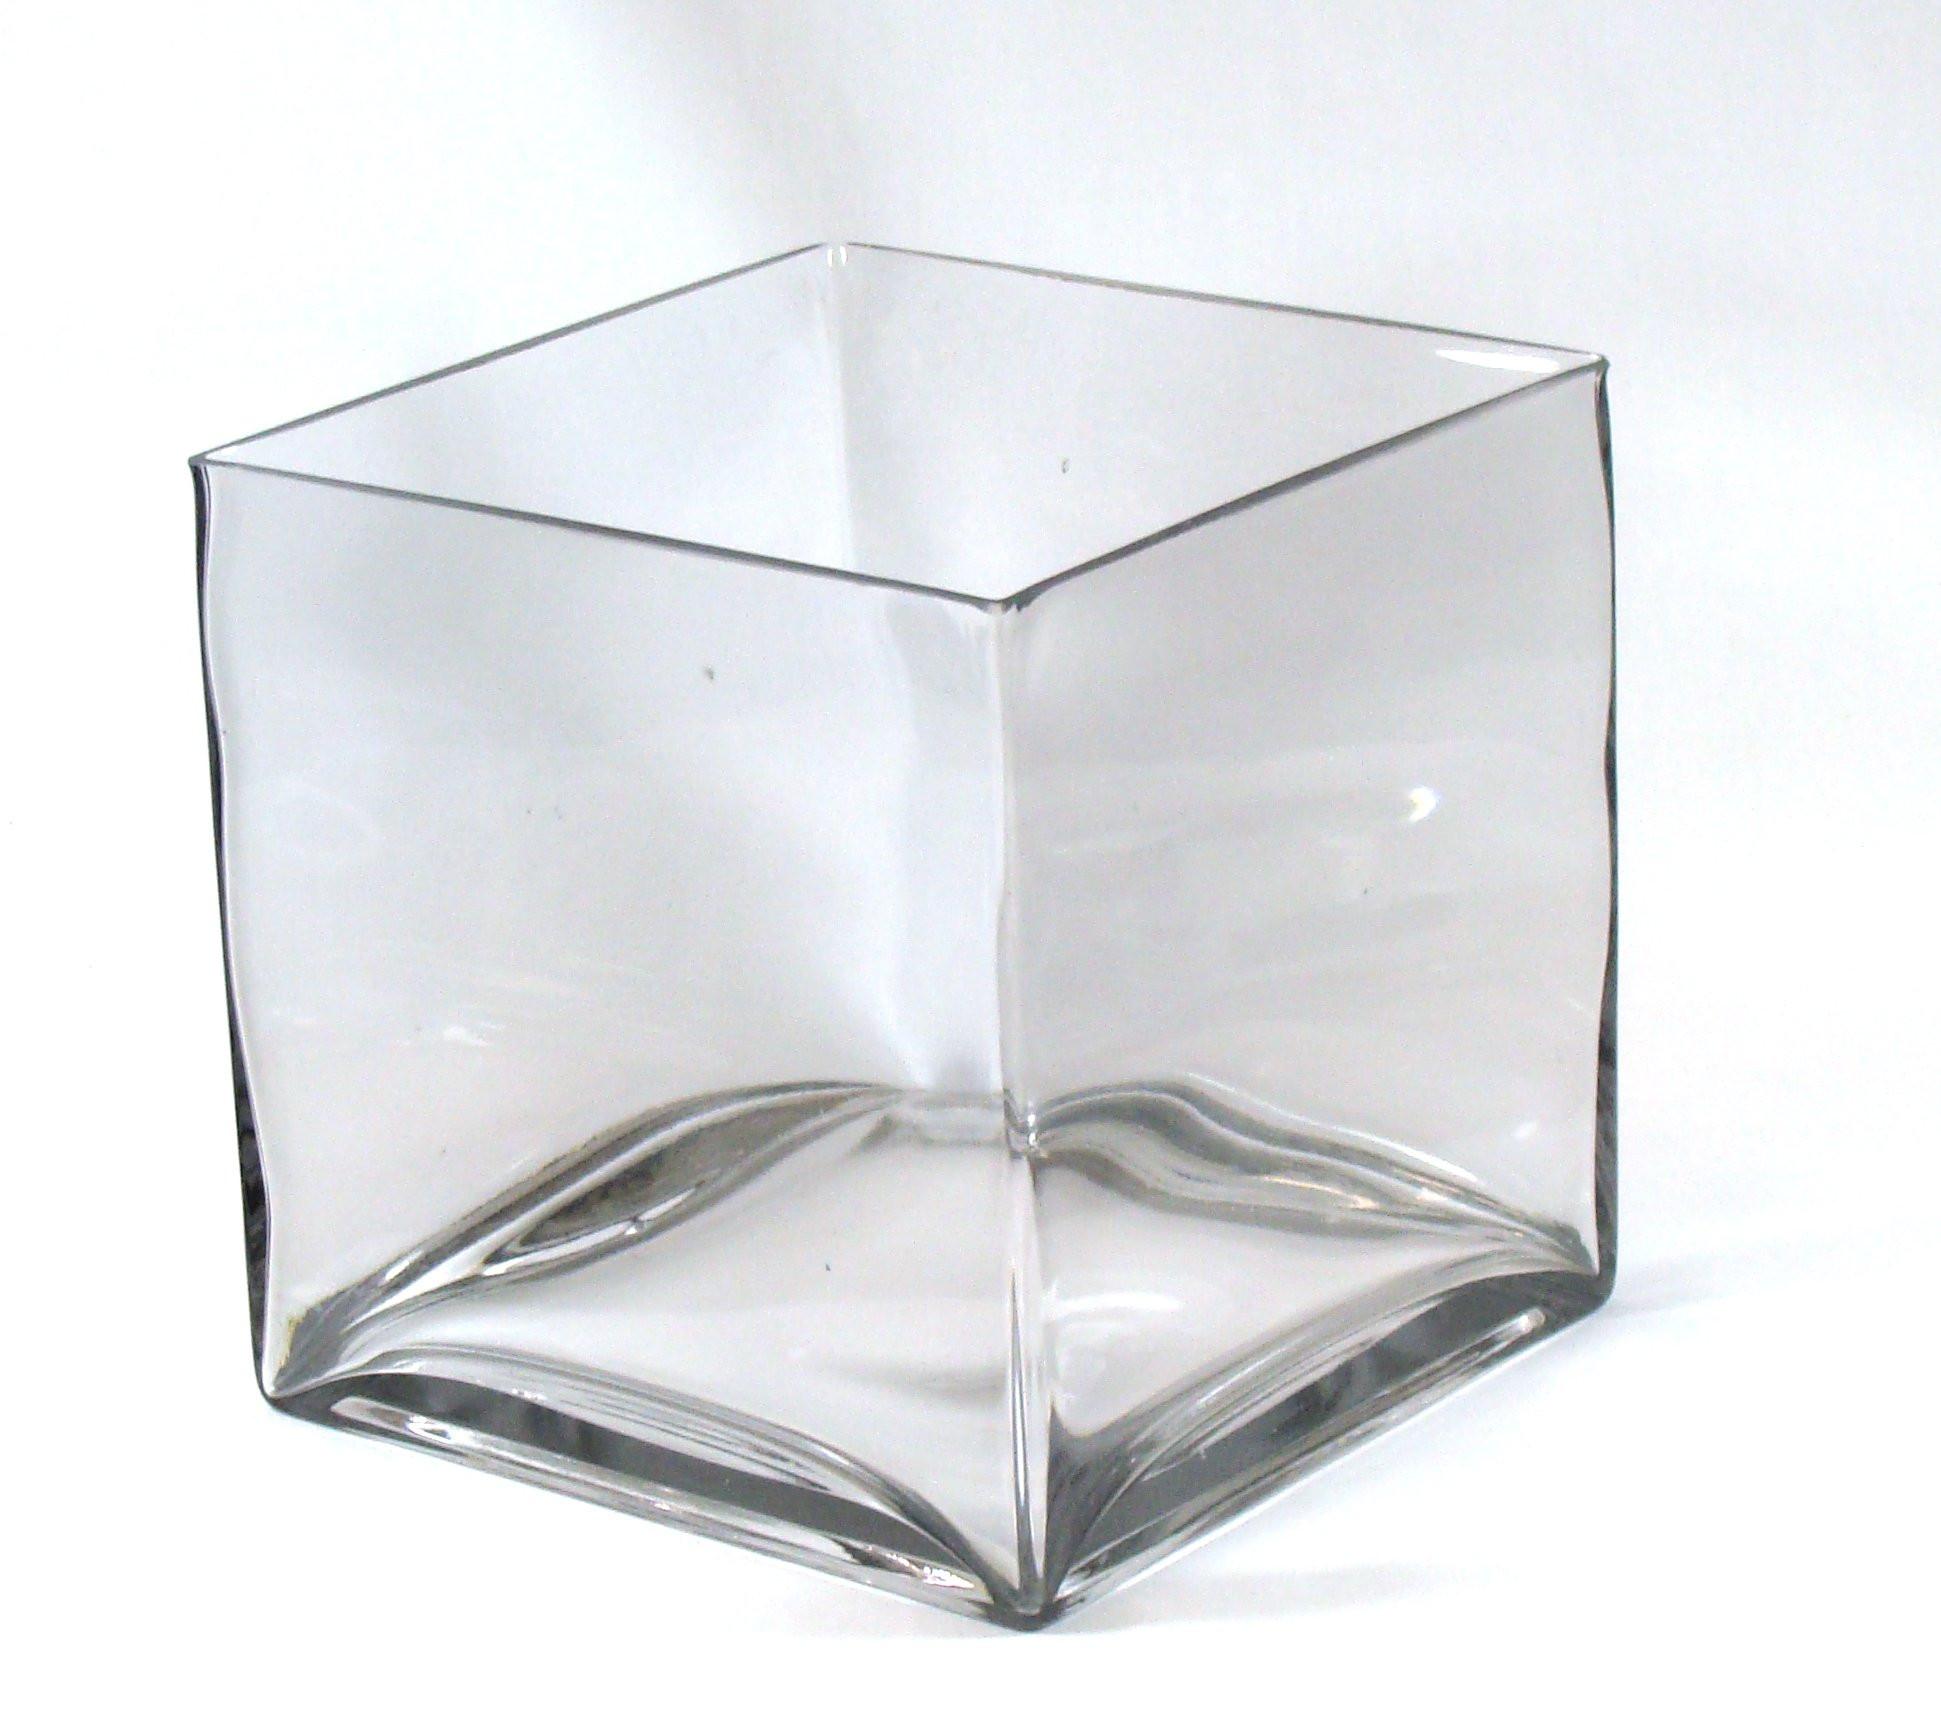 oversized glass vases wholesale of buy 8 inch round large glass vase 8 clear cylinder oversize within 8 square large glass vase 8 inch clear cube oversize centerpiece 8x8x8 candleholder